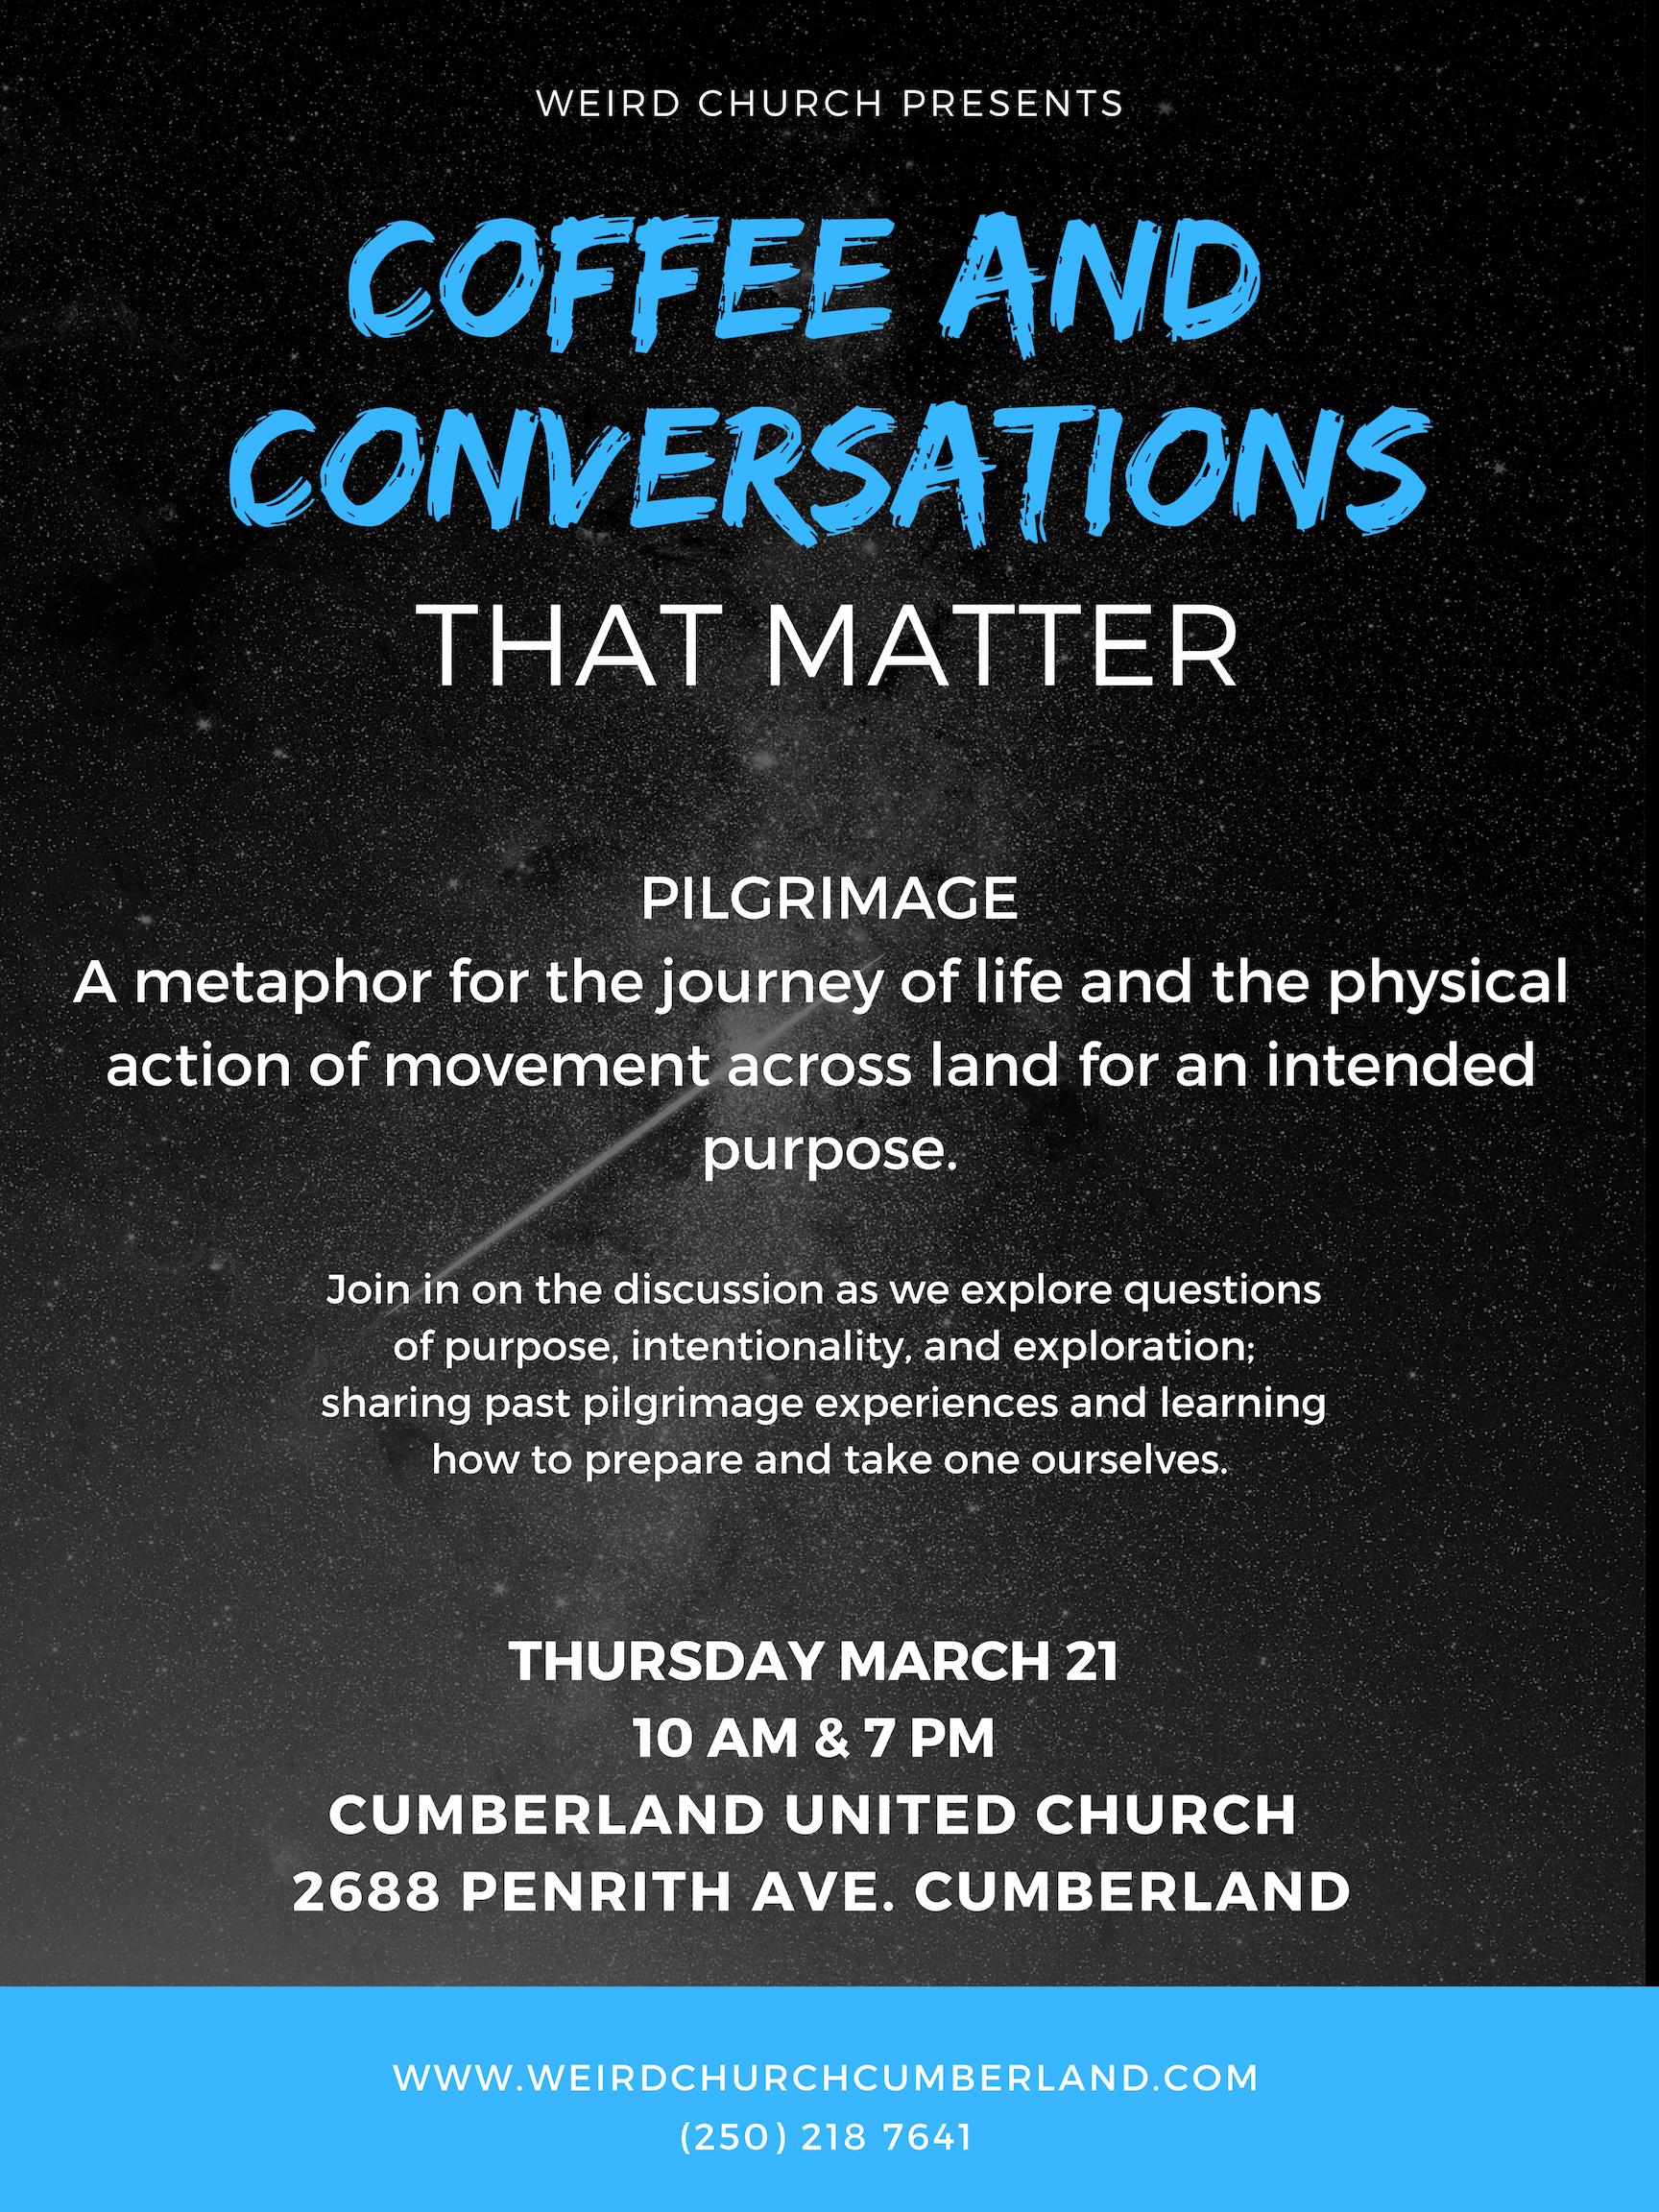 C & C March 2019 Pilgrimage.png